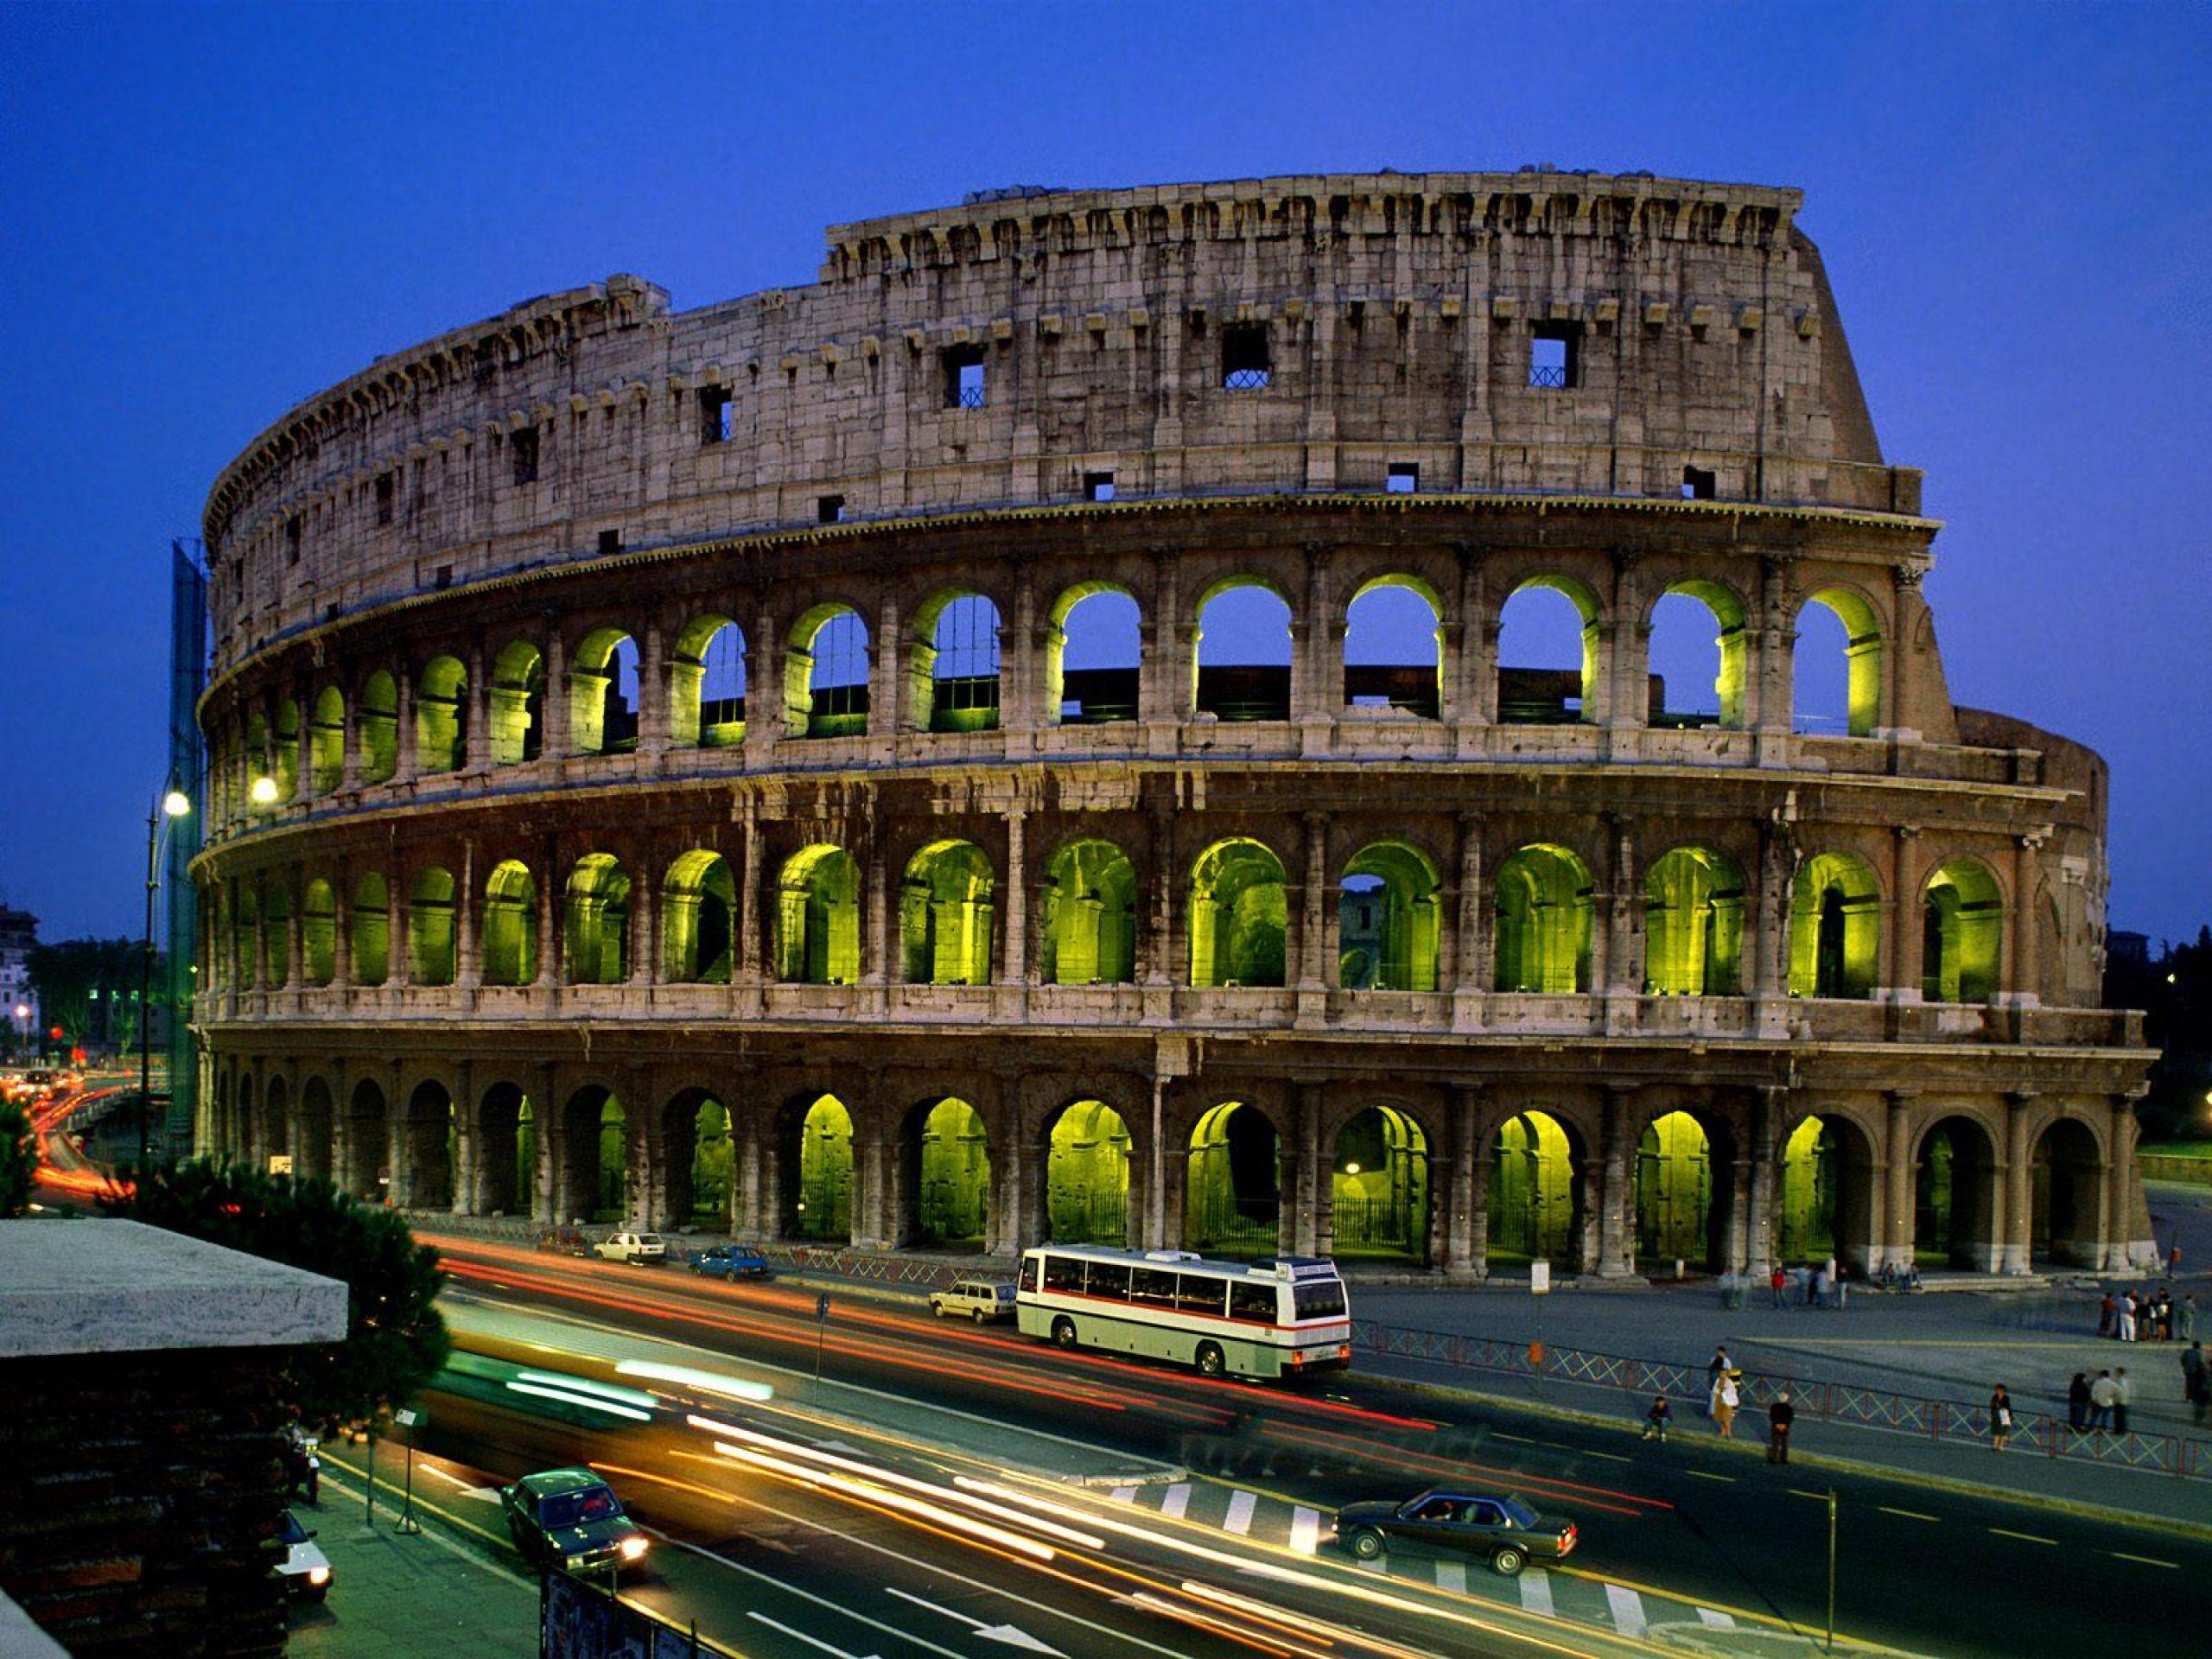 Architecture Coliseum Rome 629267 Wallpaper wallpaper